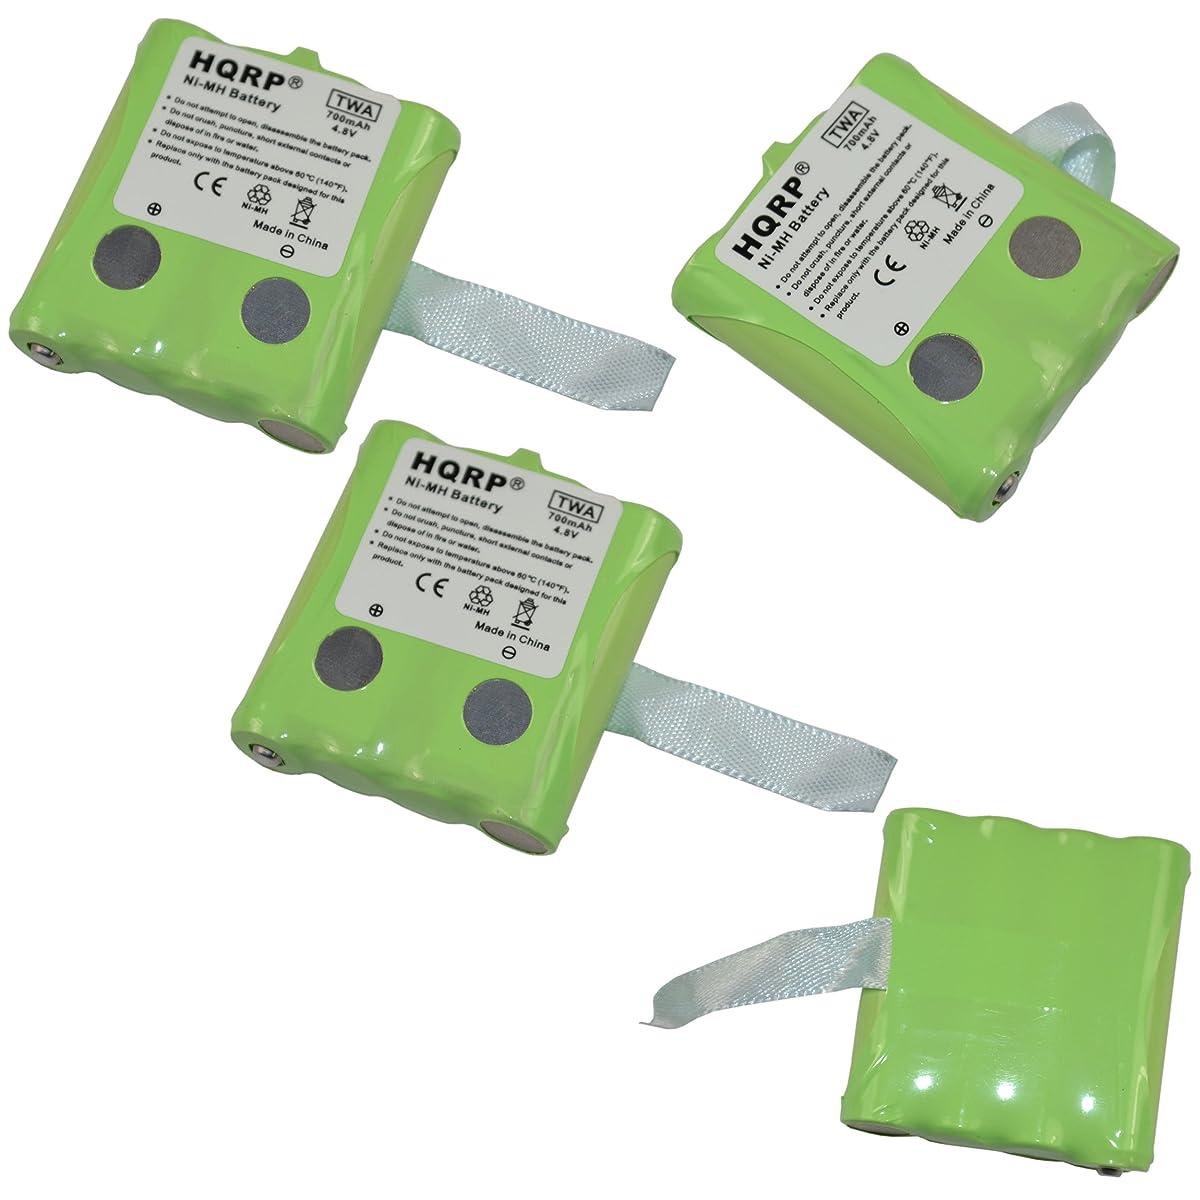 HQRP 4-Pack Battery for Midland BATT4R G223 G225 G226 G227 G300 G300M G500 GXT200 GXT250 GXT255 Two-Way Radio